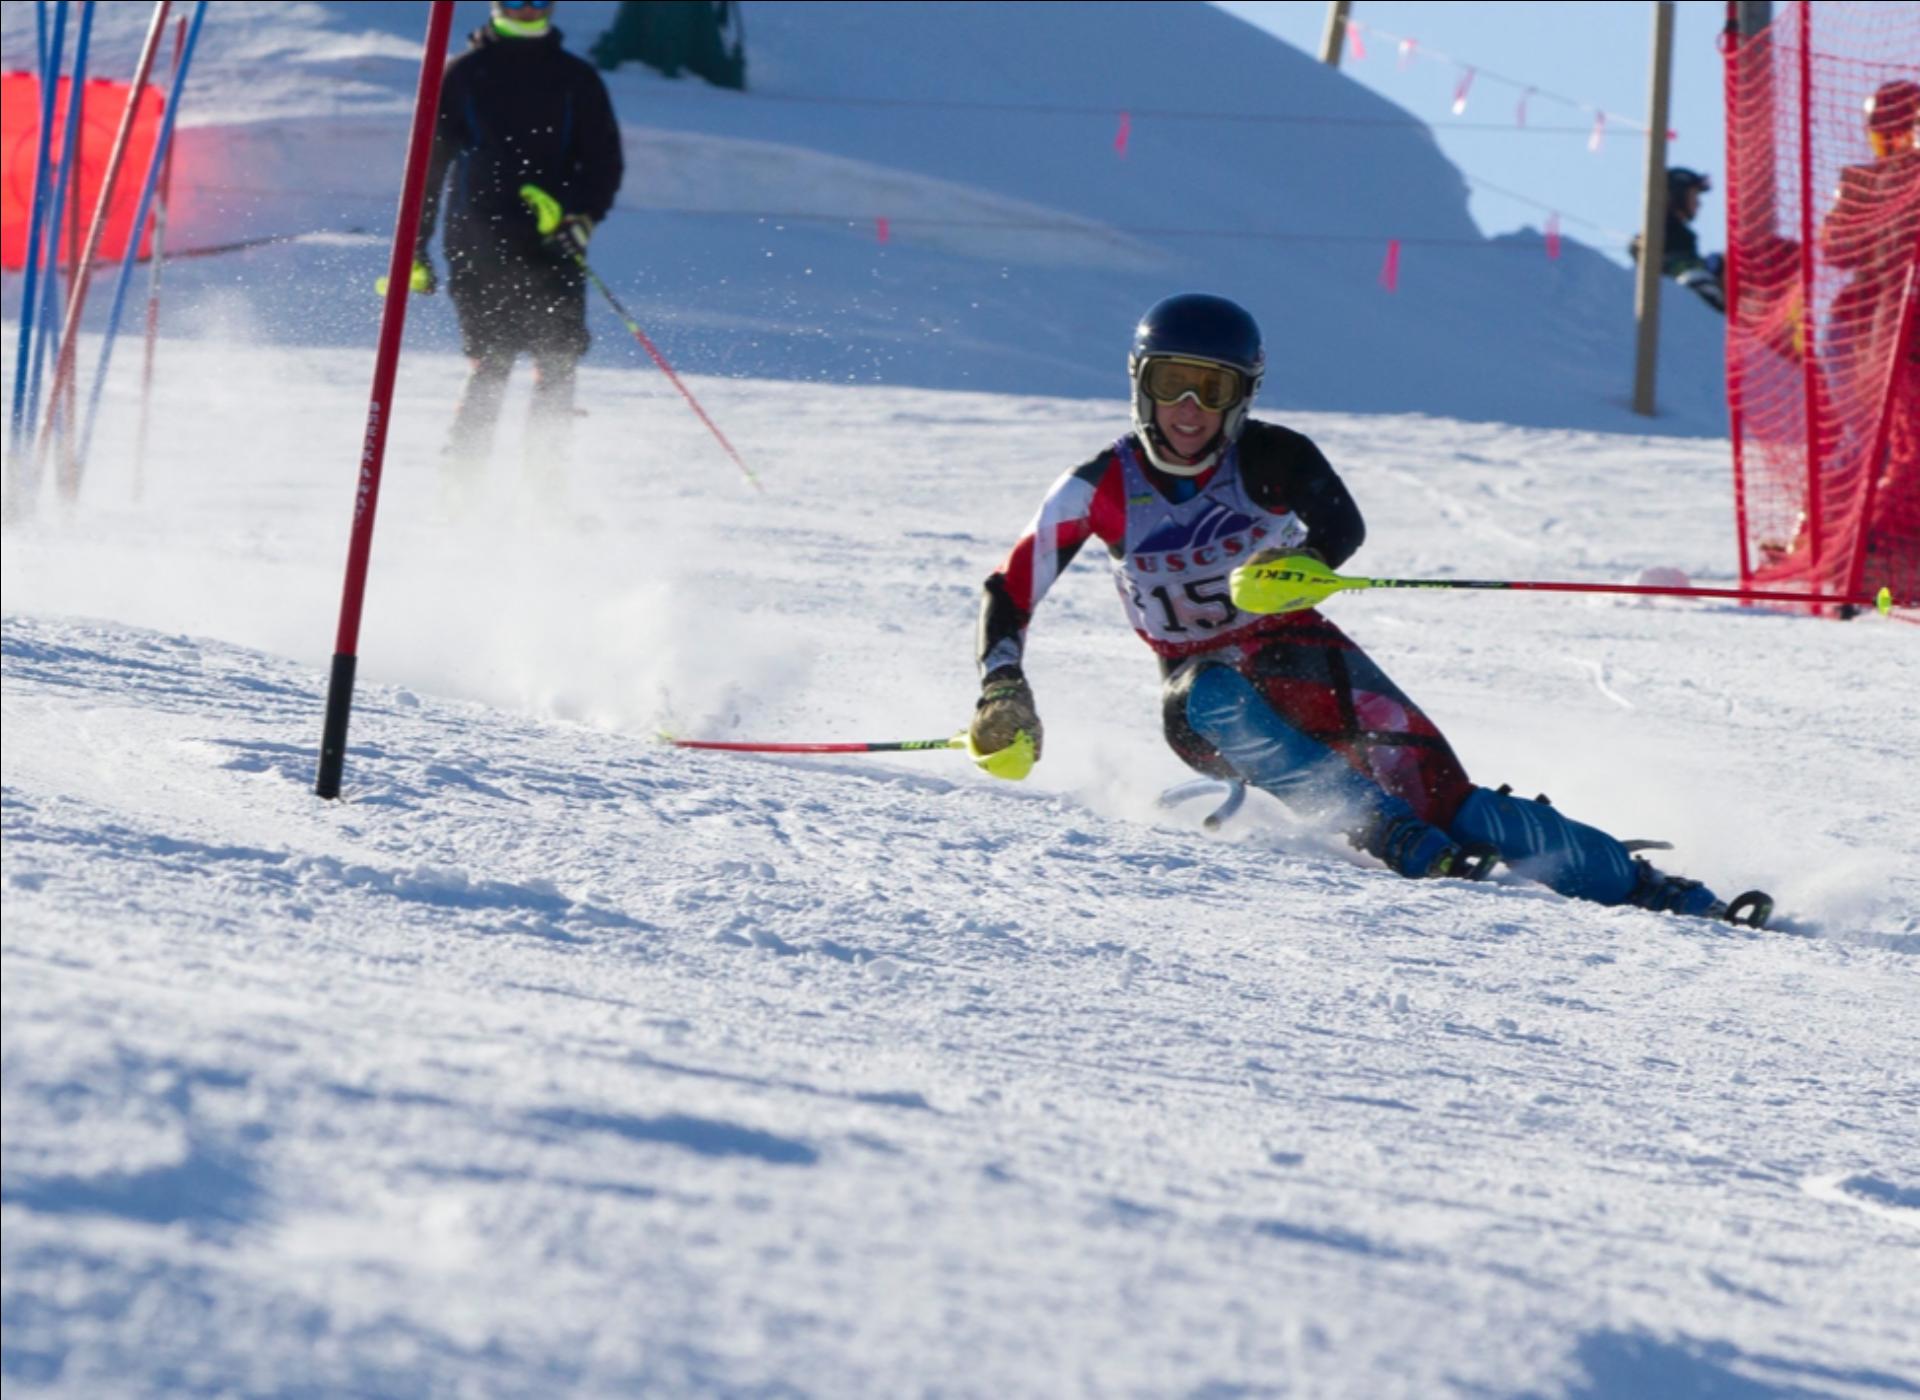 Alpine Action